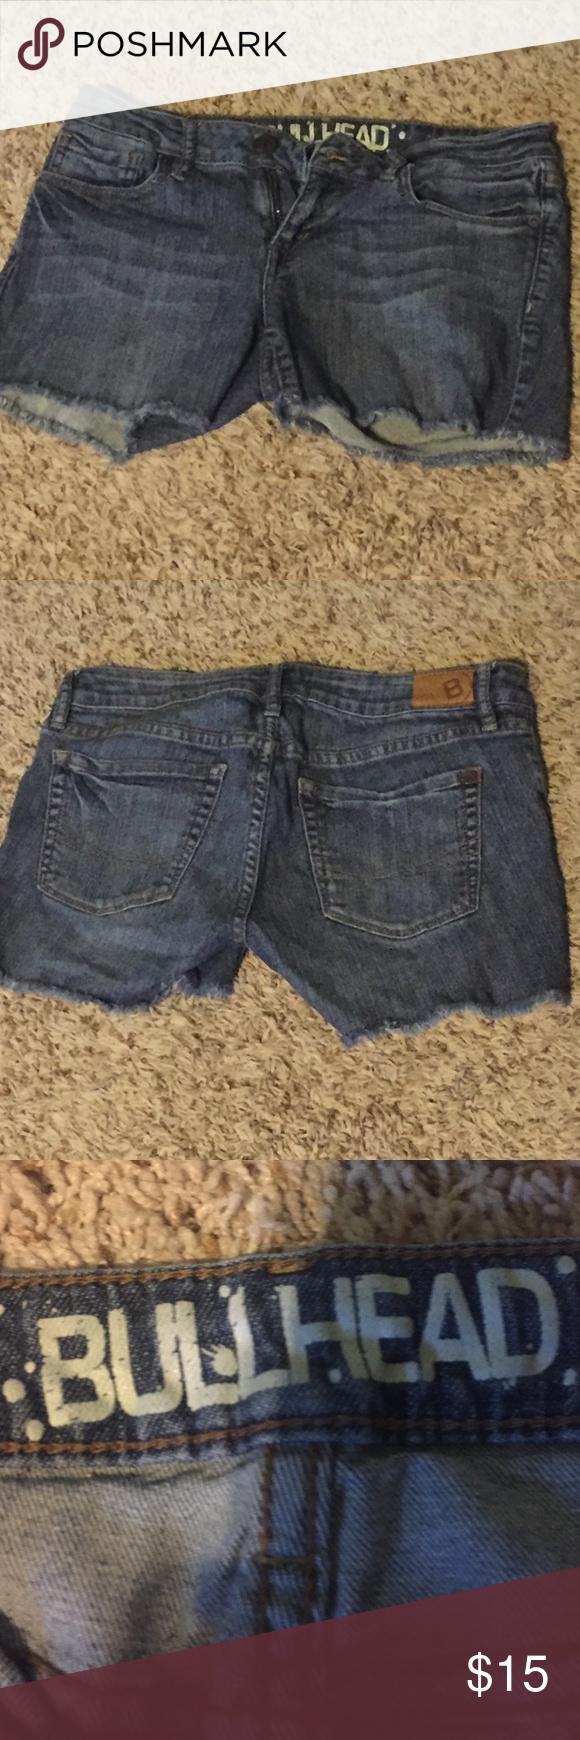 Cut off shorts Bullhead denim cut off shorts Bullhead Shorts Jean Shorts